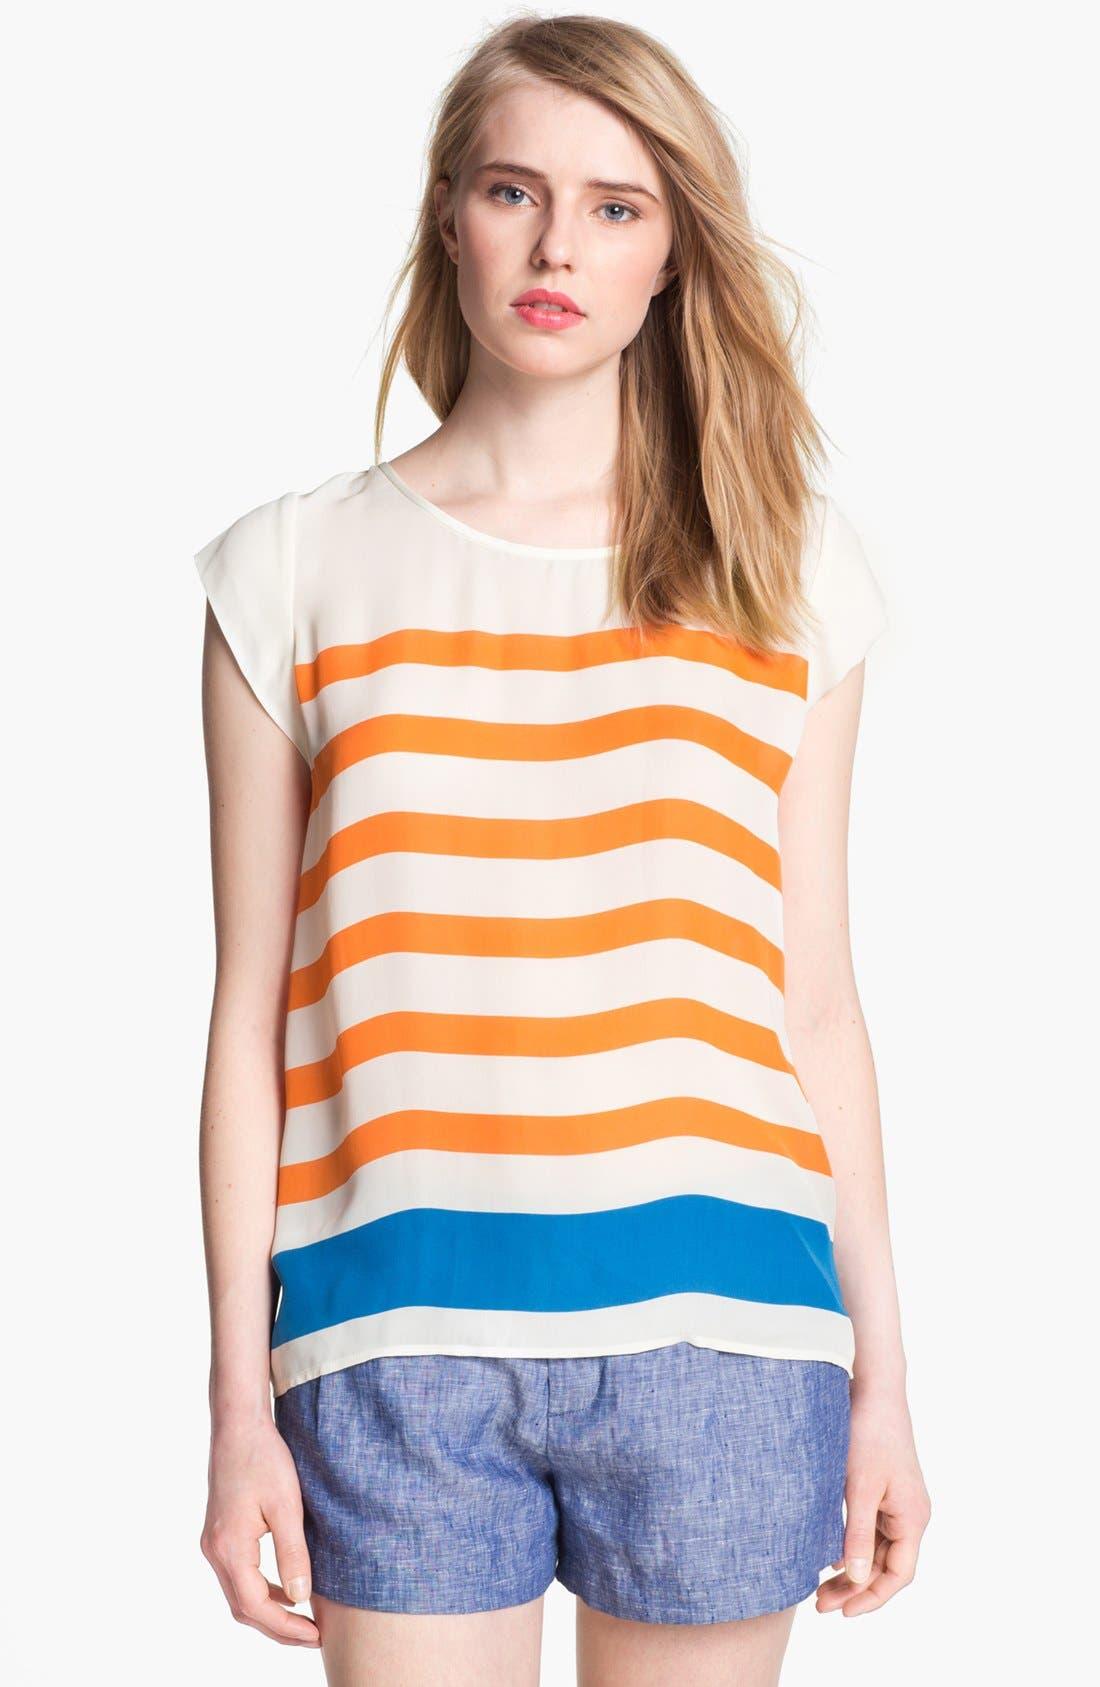 Alternate Image 1 Selected - Joie 'Terry' Stripe Silk Top